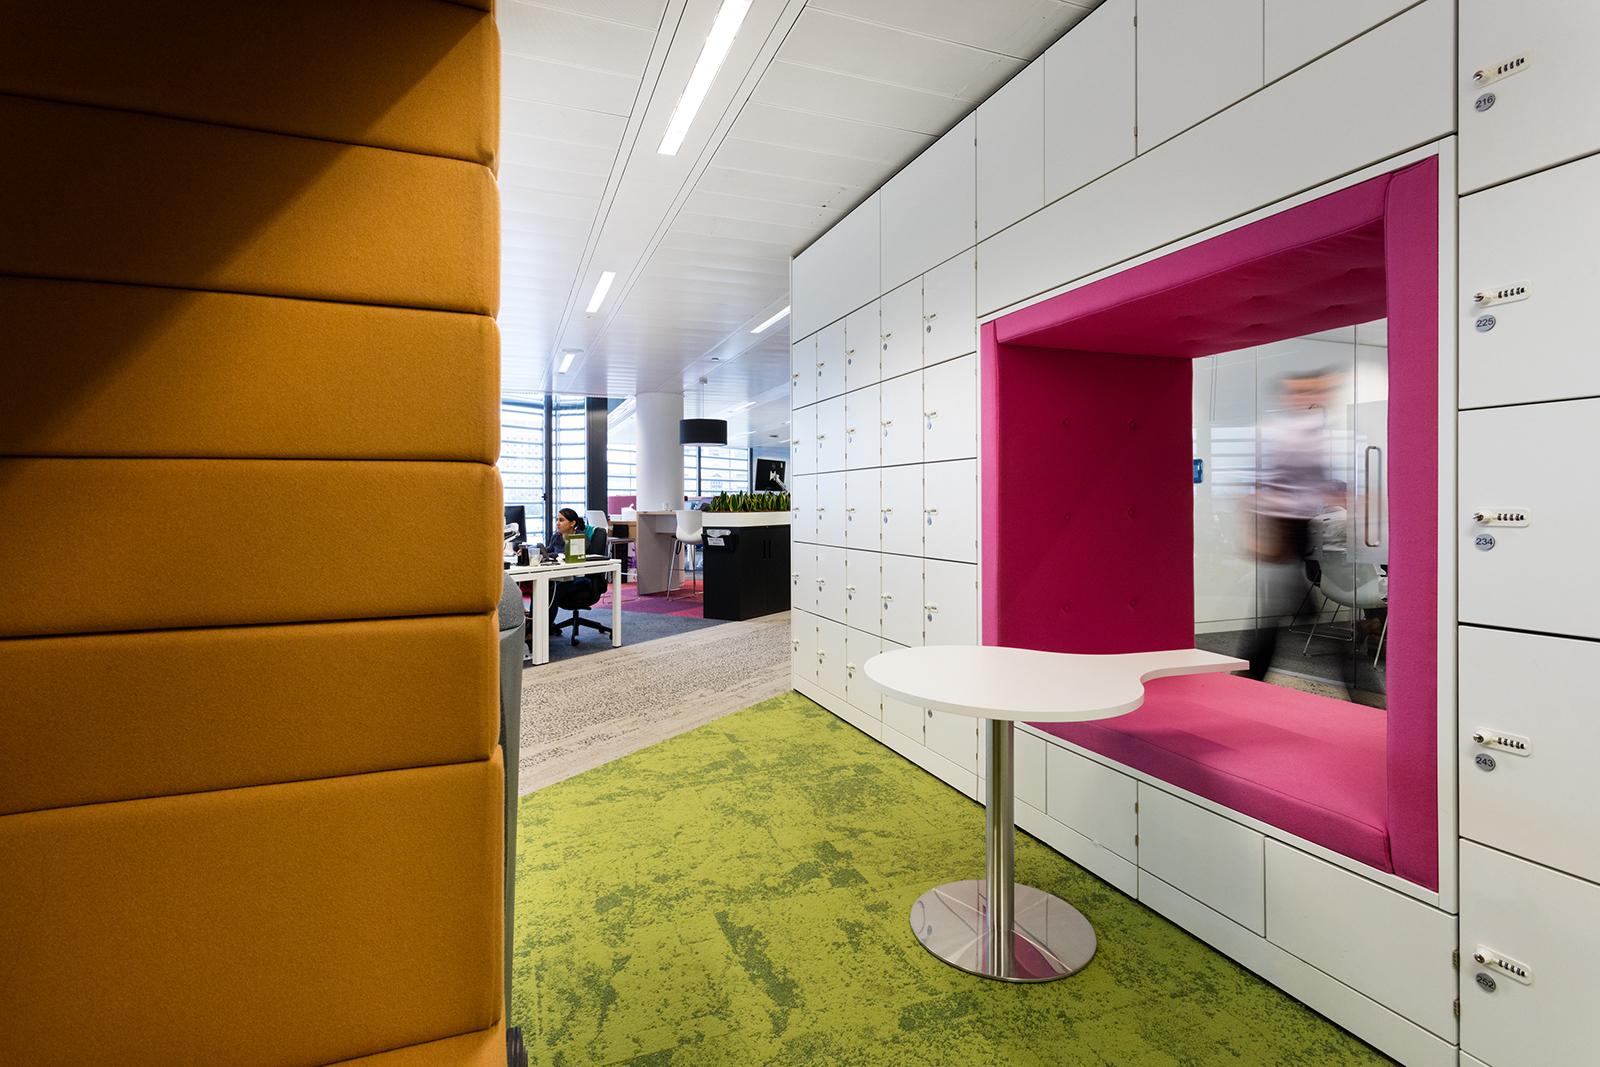 tns-uk-office-11